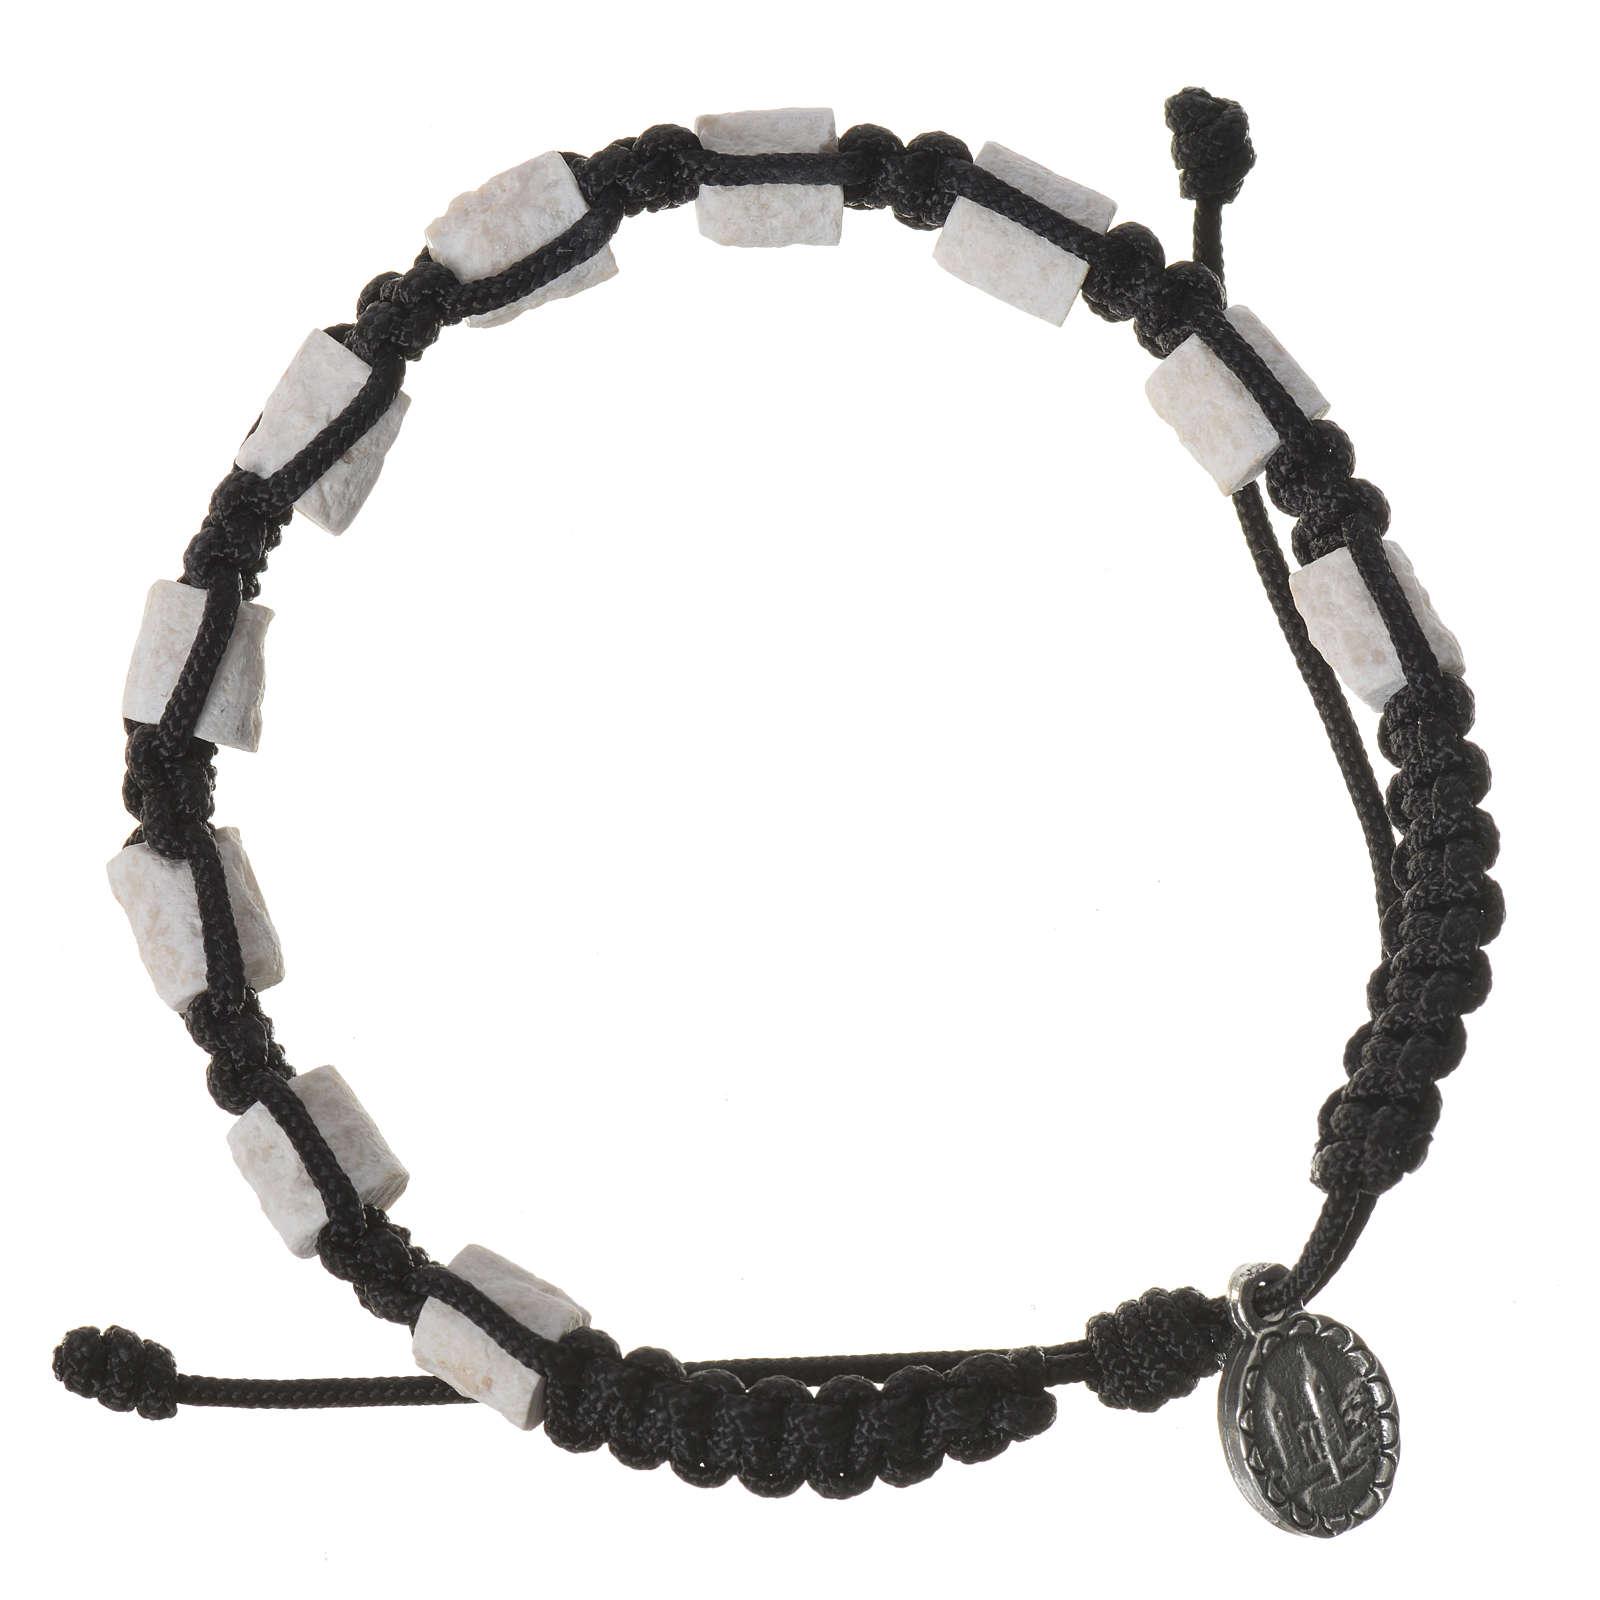 Medjugorje single-decade bracelet, stone and black cord 4